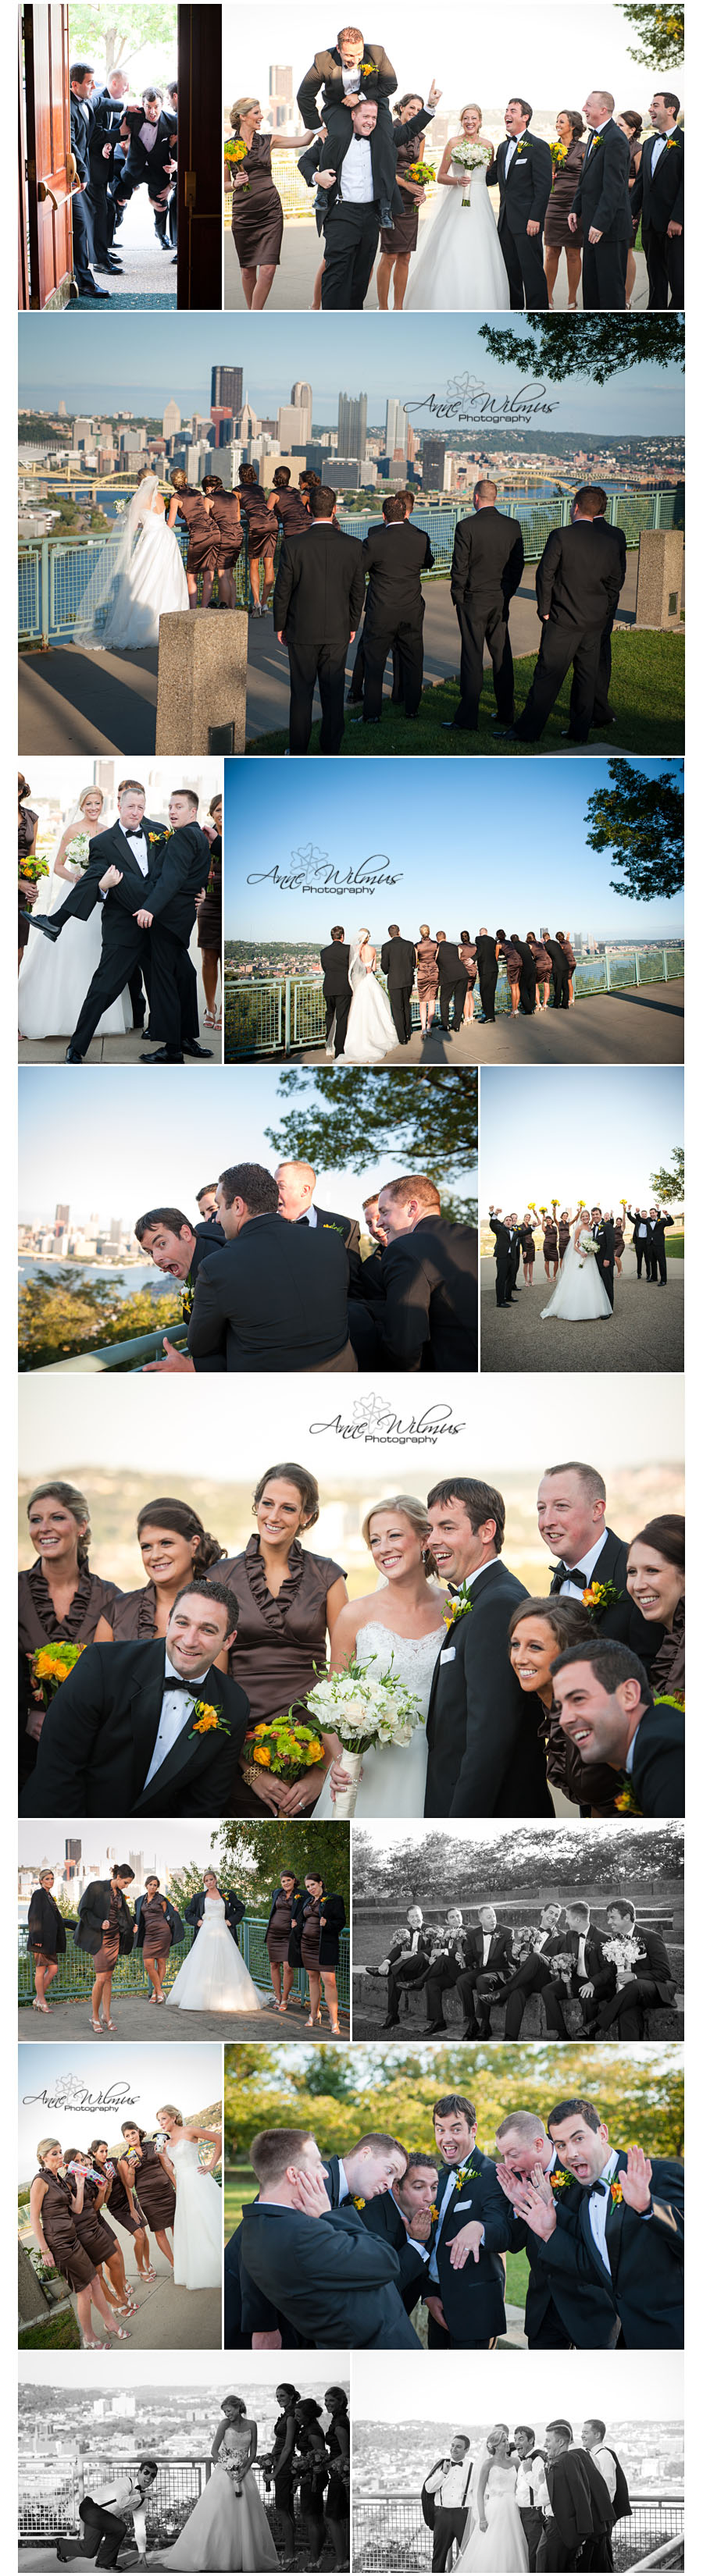 Fun-group-wedding-photo-ideas.jpg (900×3300)